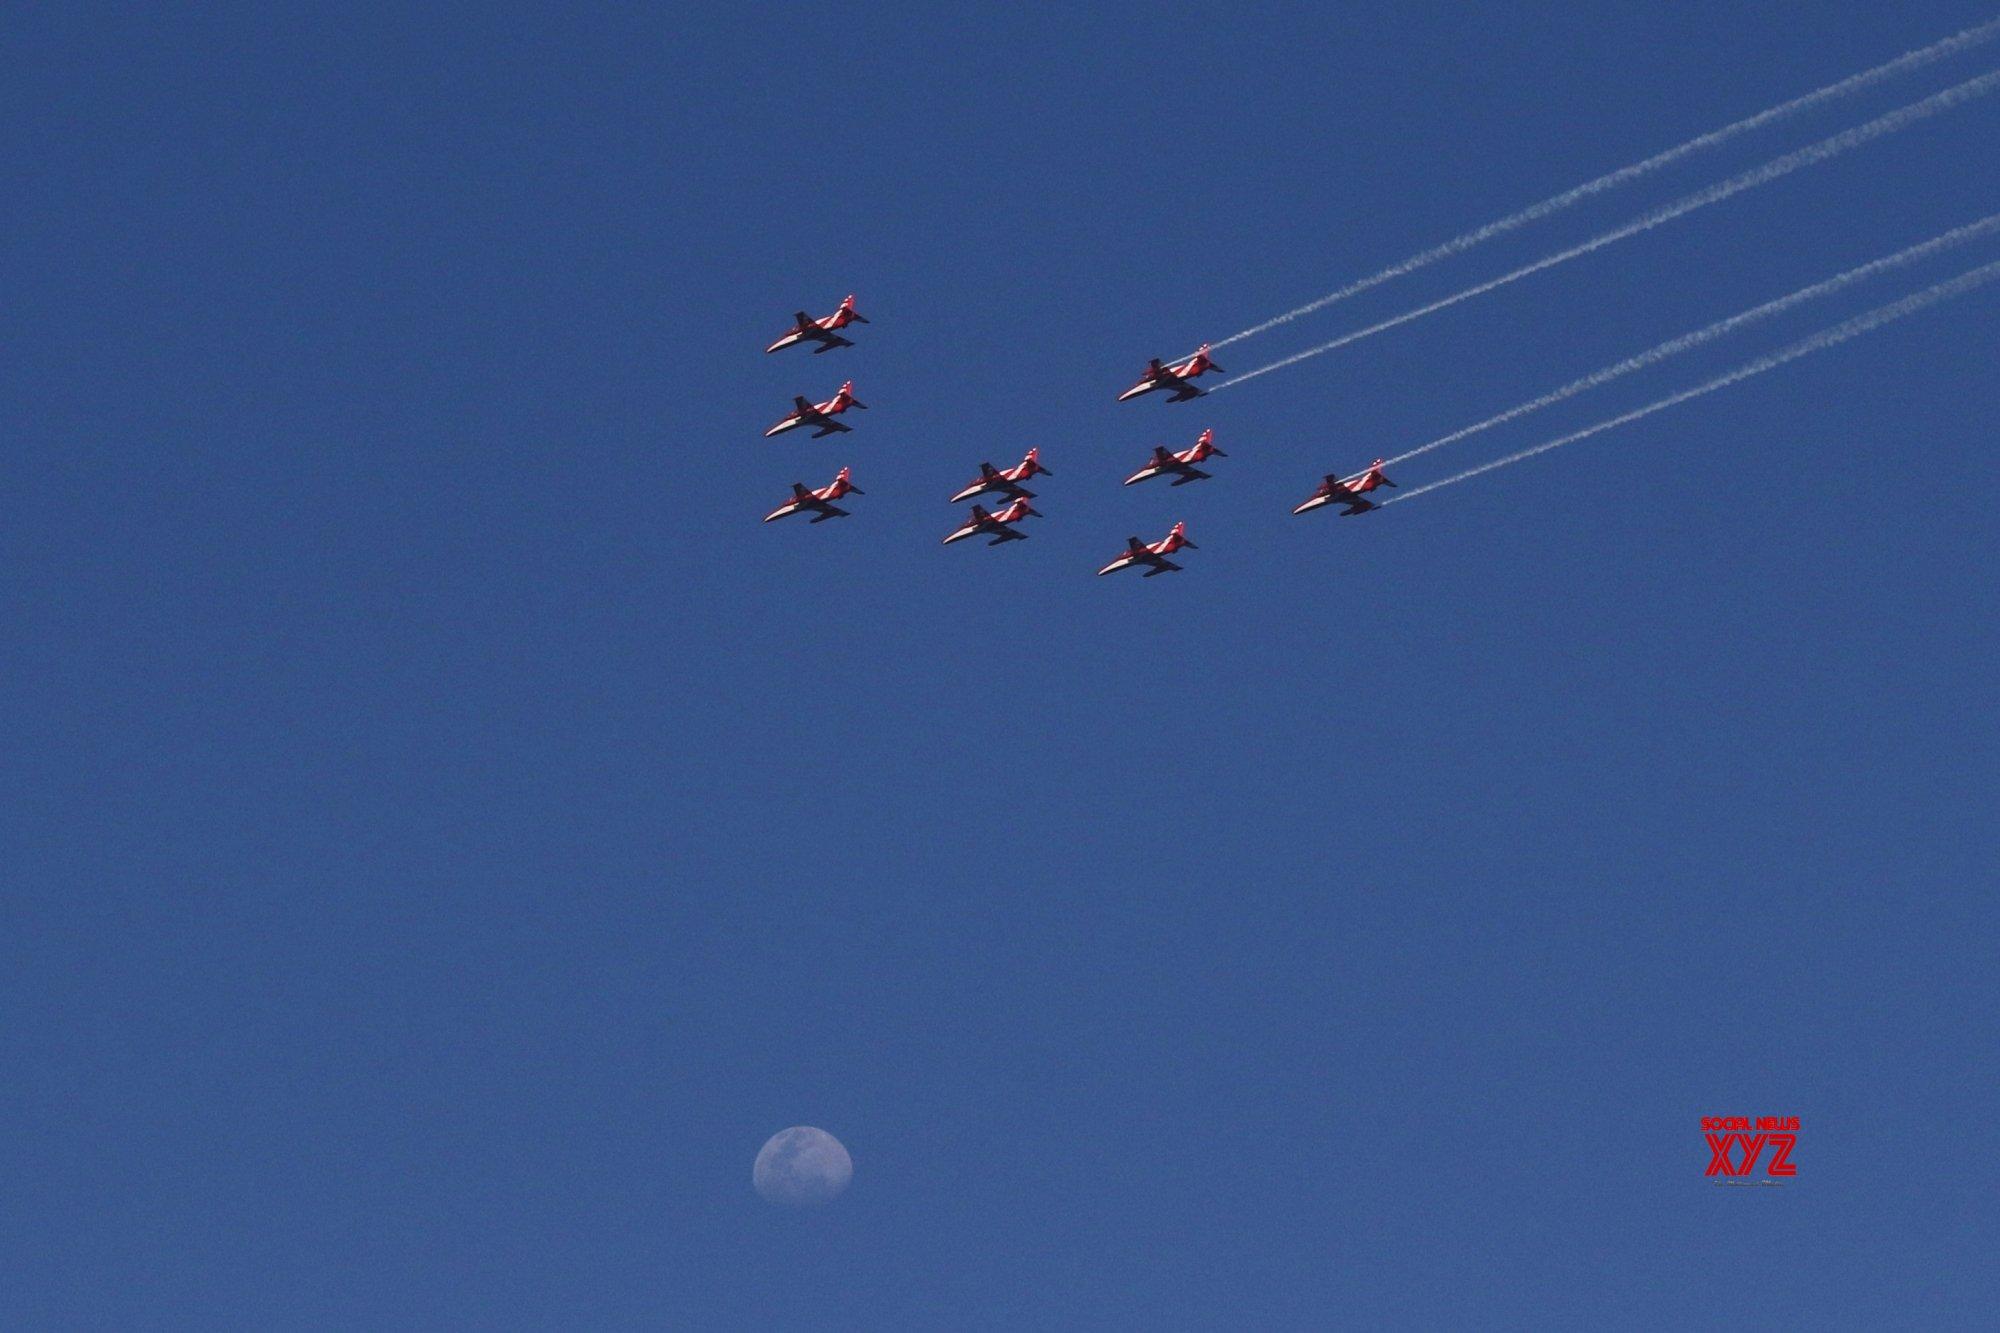 Chennai: Suryakiran Aerobatic Team flypast at Chennai Marina Beach in commemoration of 50years of Indo Pak 1971 war victory on Tuesday 23rd February, 2021. #Gallery